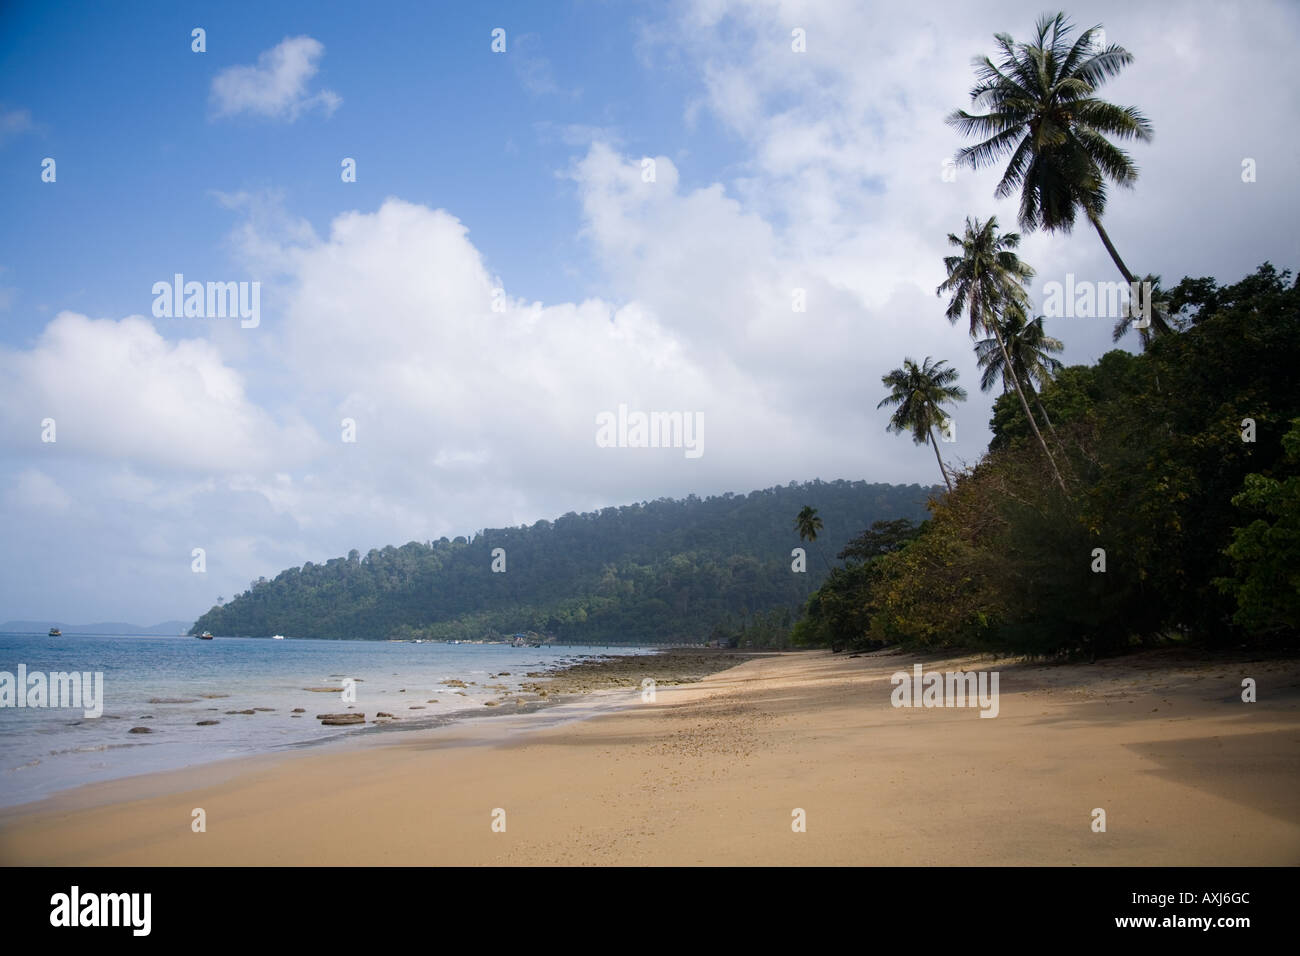 Playa en Air Batang village. La isla de Tioman. Malasia Foto de stock